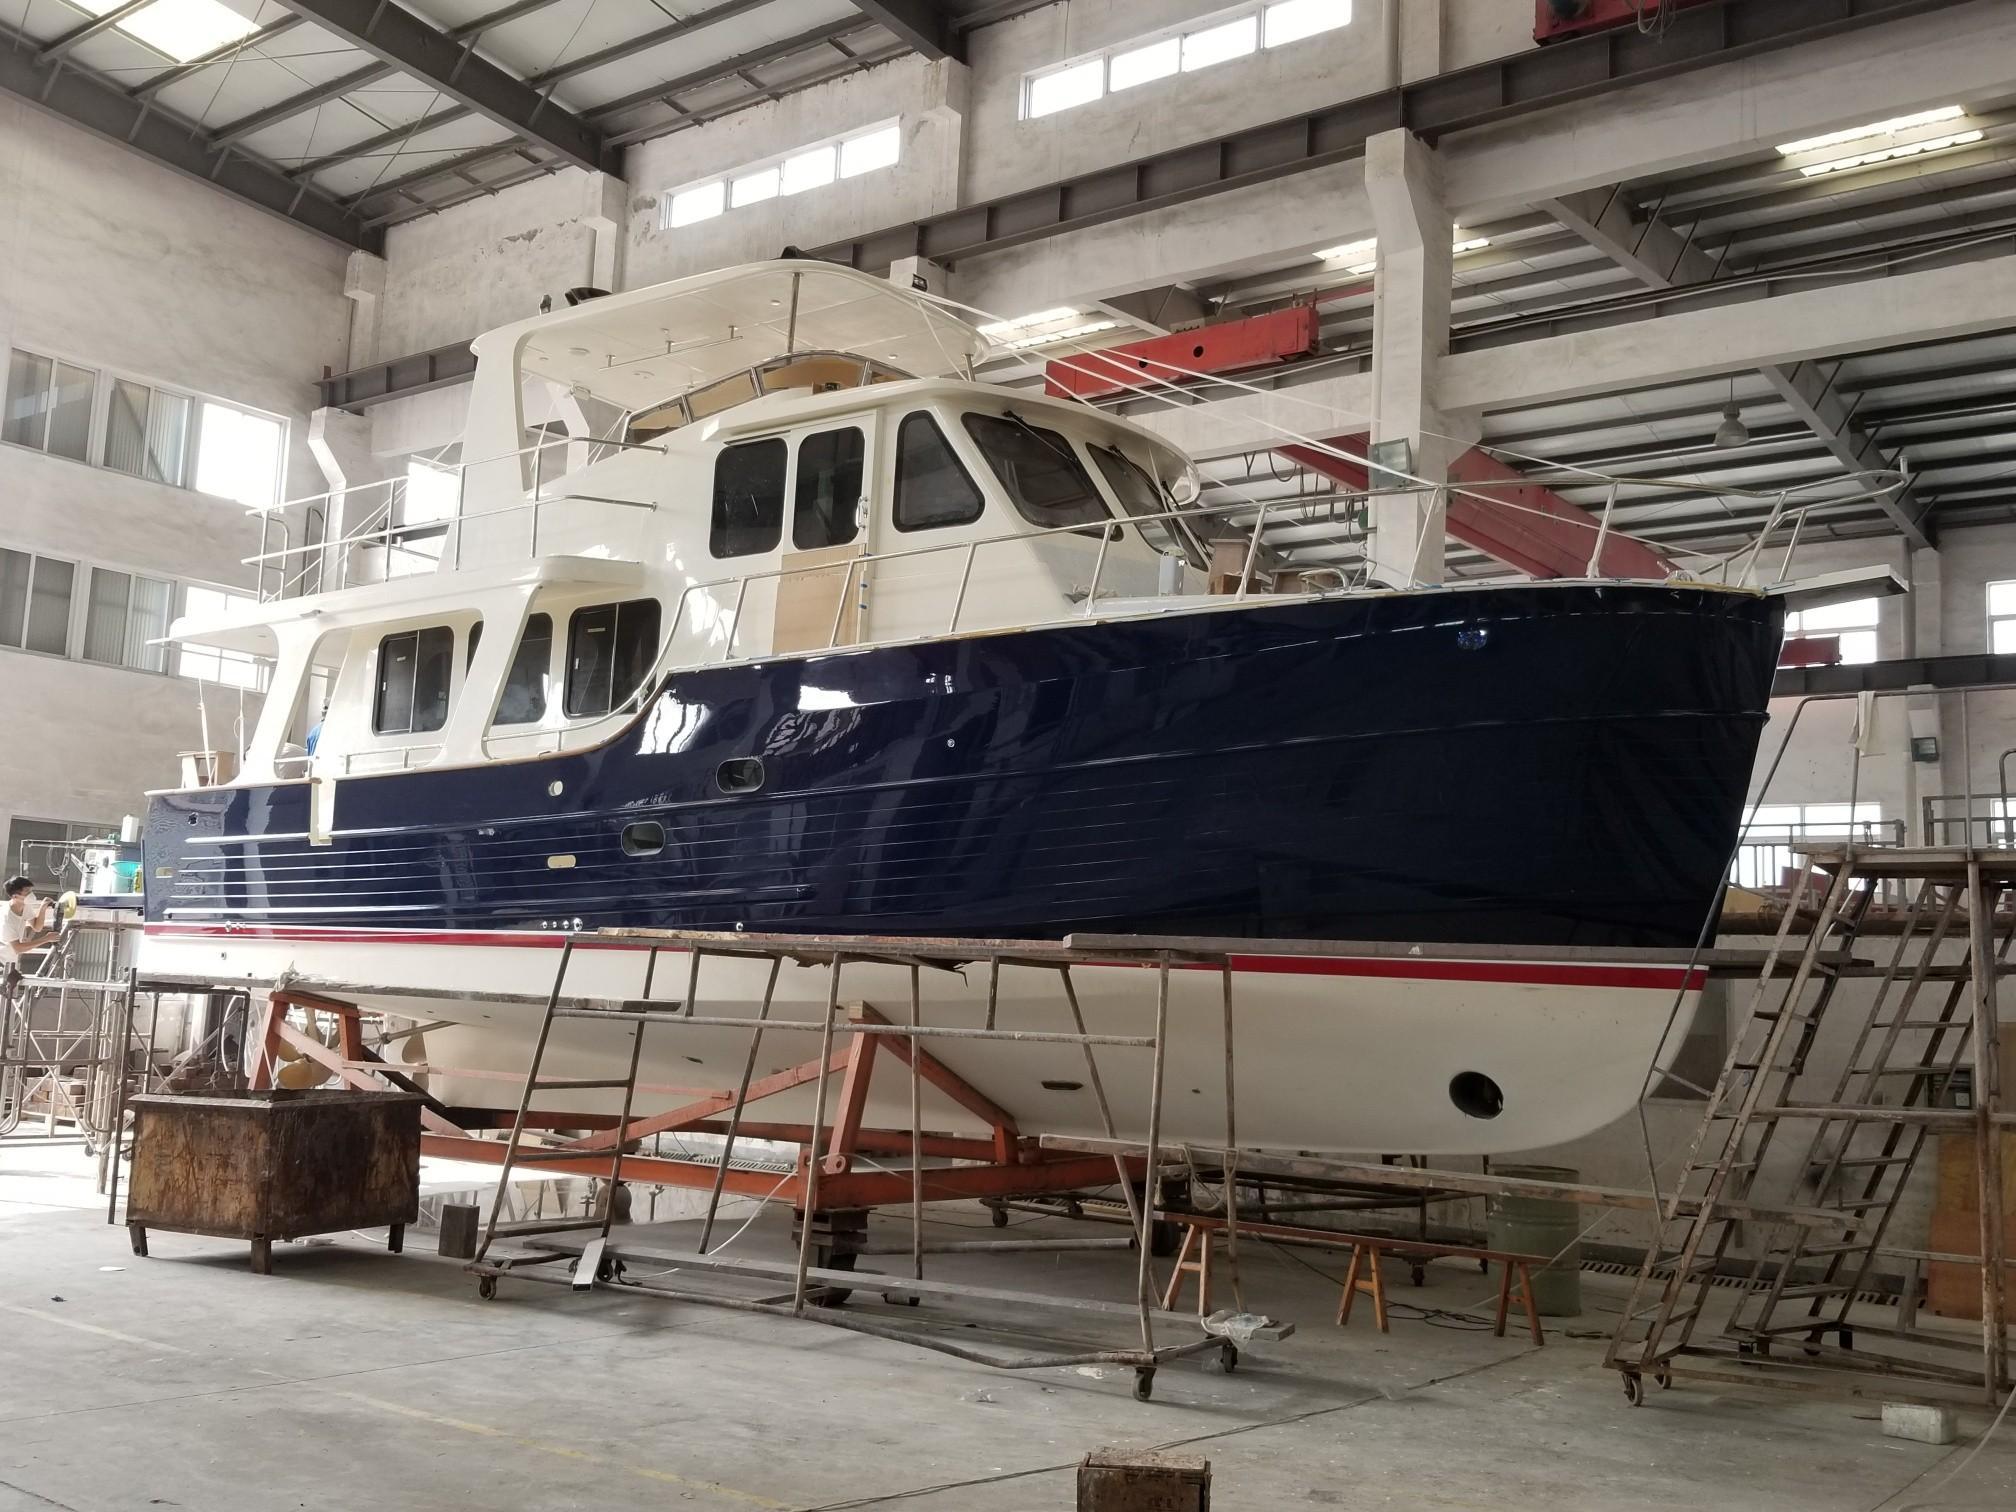 46 Explorer Pilot House Yacht For Sale 46 Explorer Motor